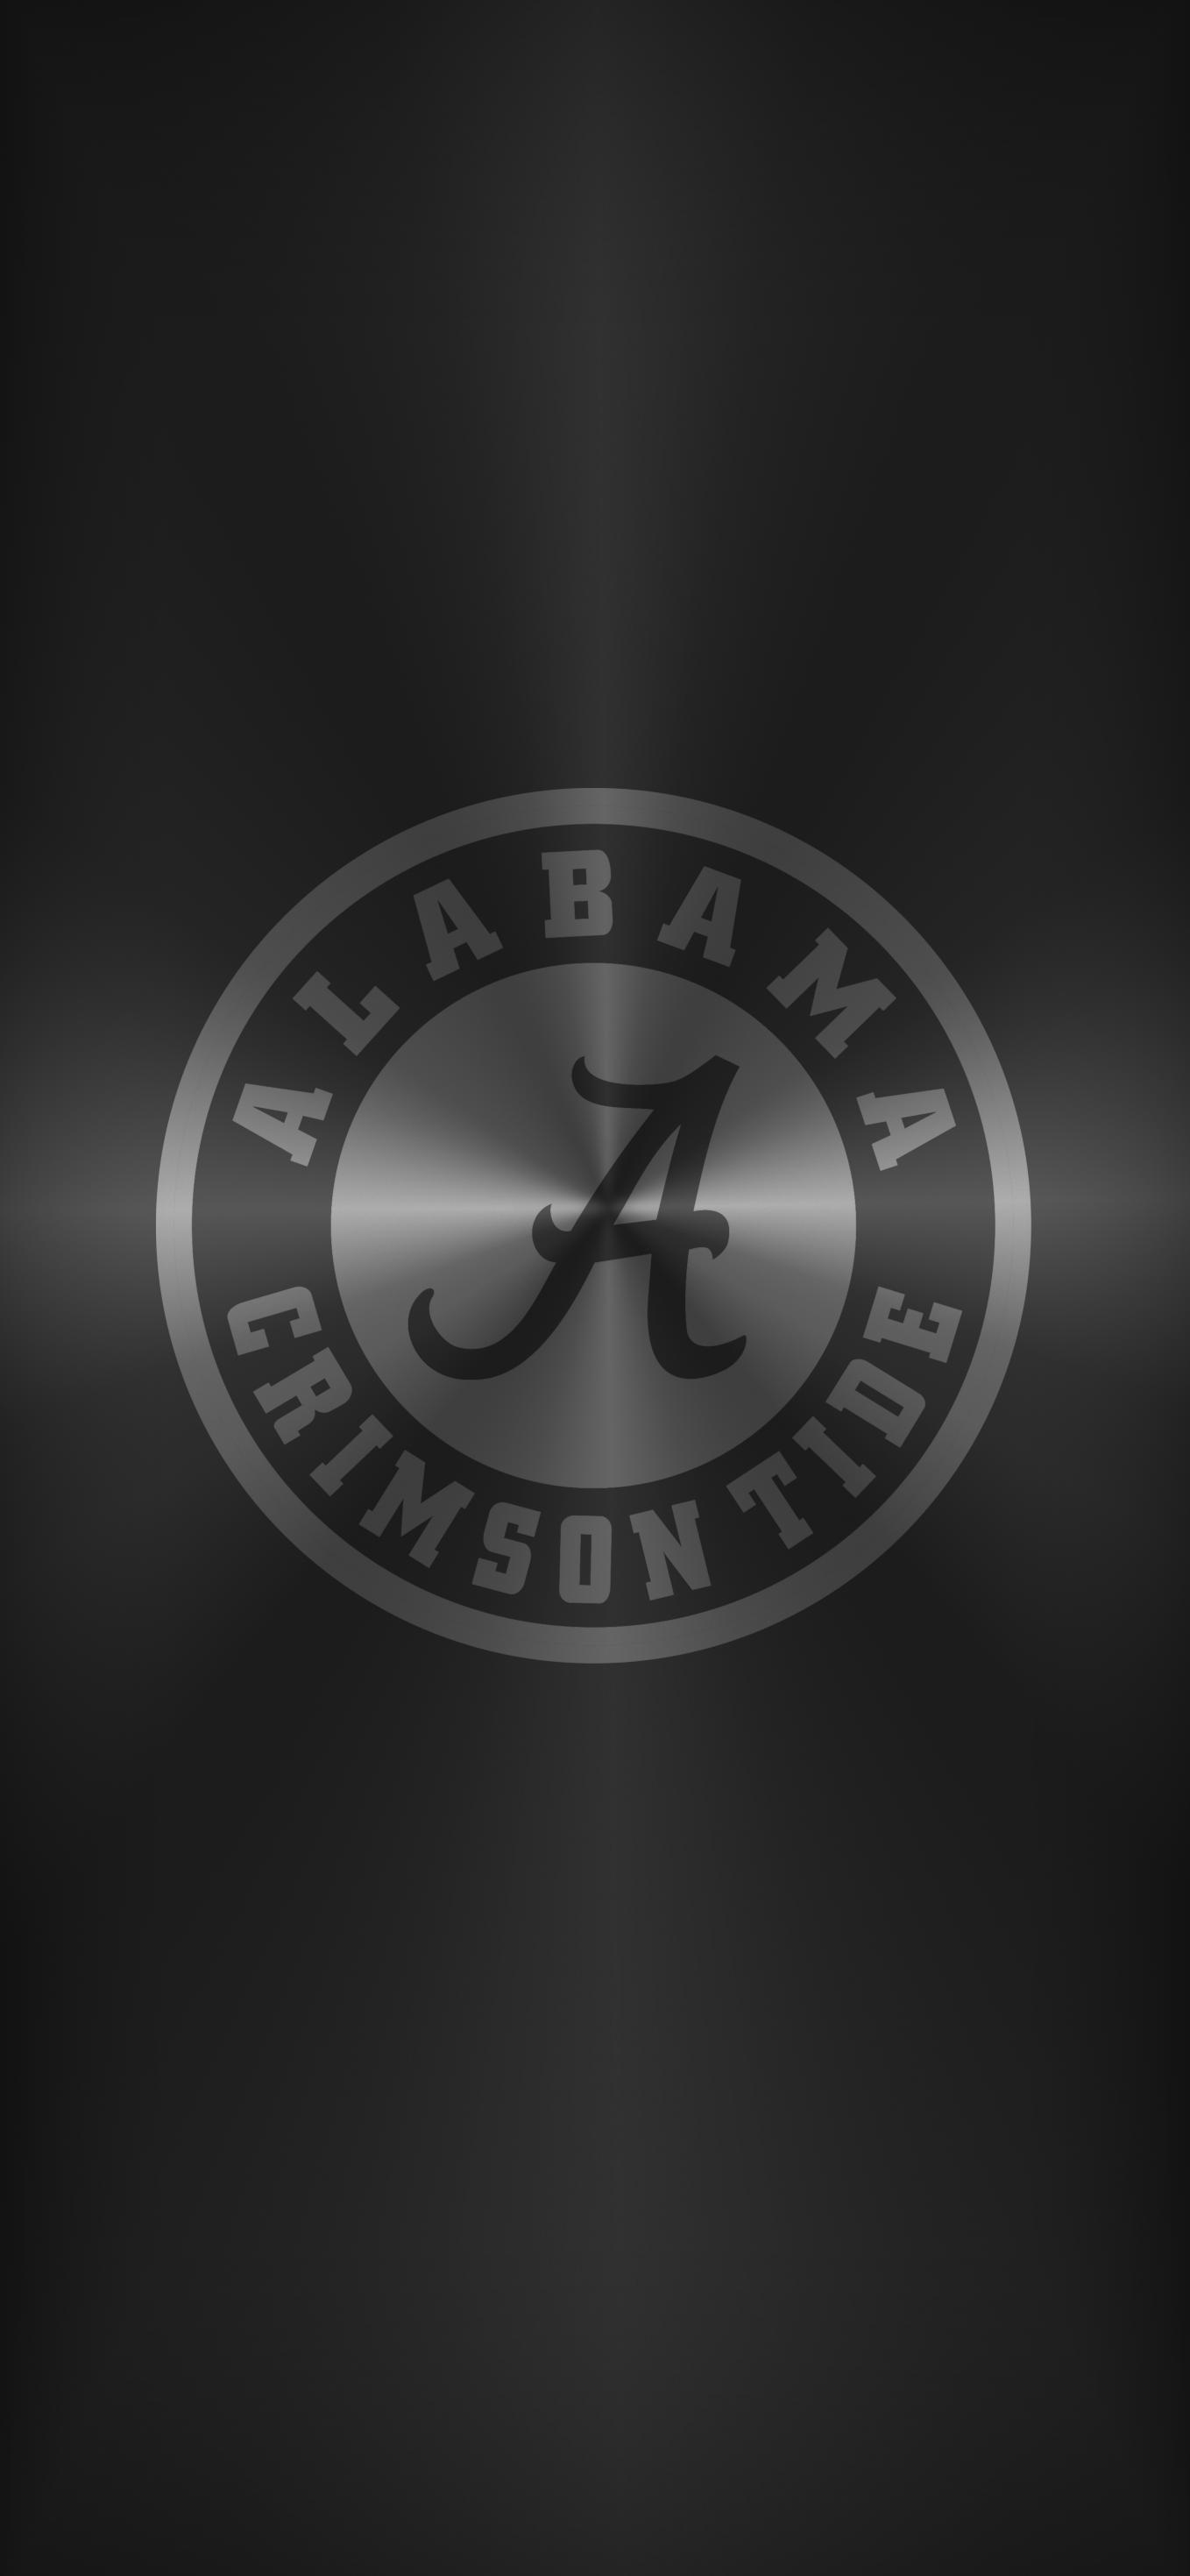 bama logo 15 Metal Alabama crimson tide logo, Alabama